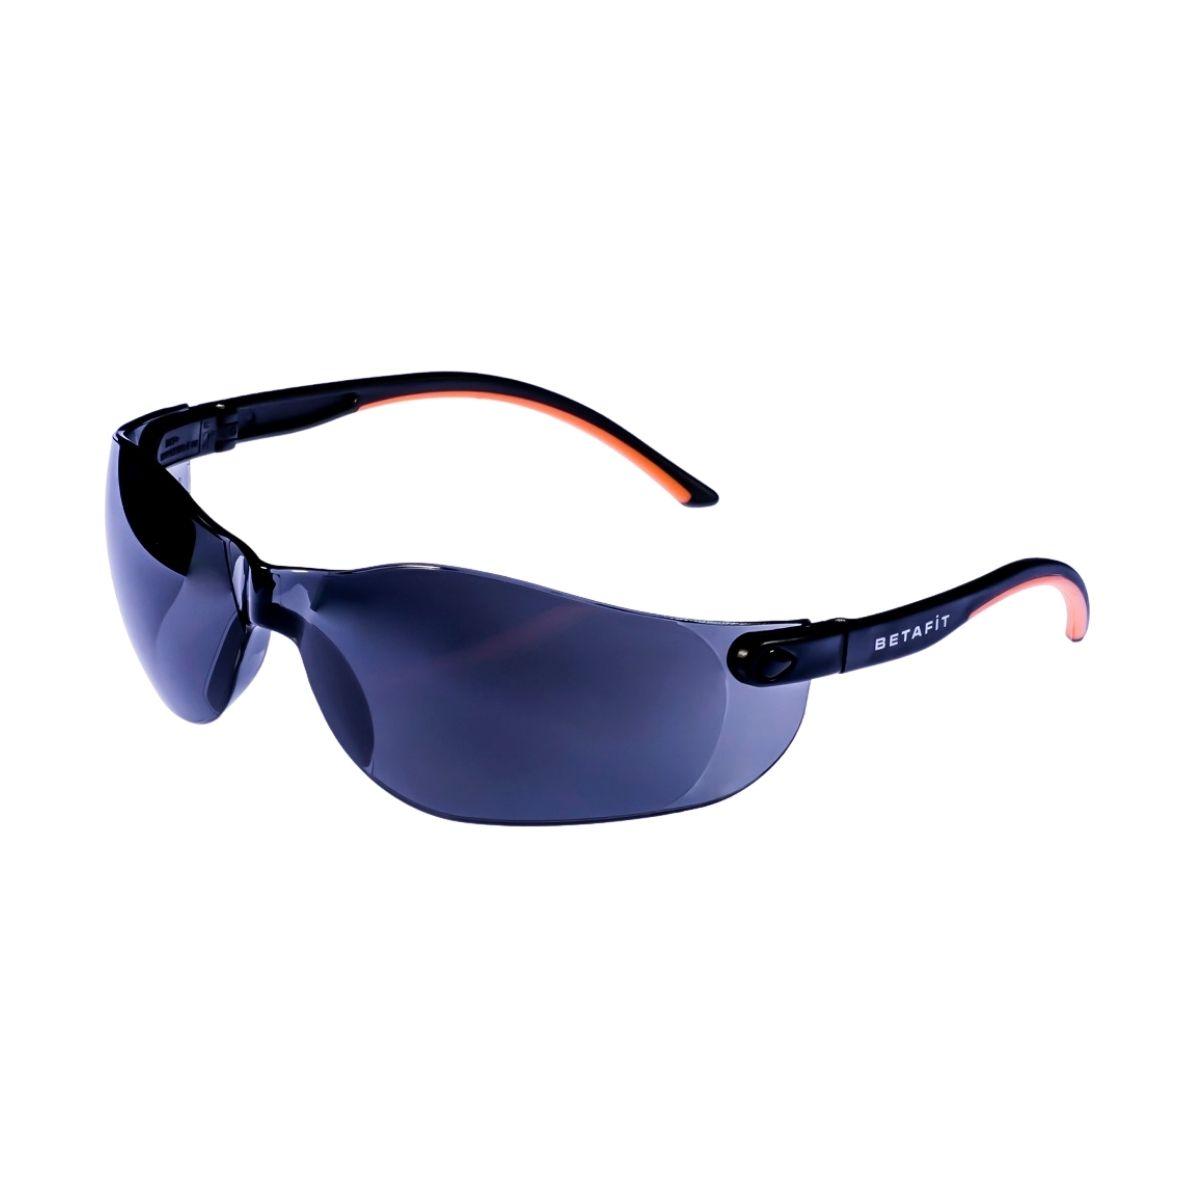 EW2203 Montana Smoke Grey Tinted Safety Glasses